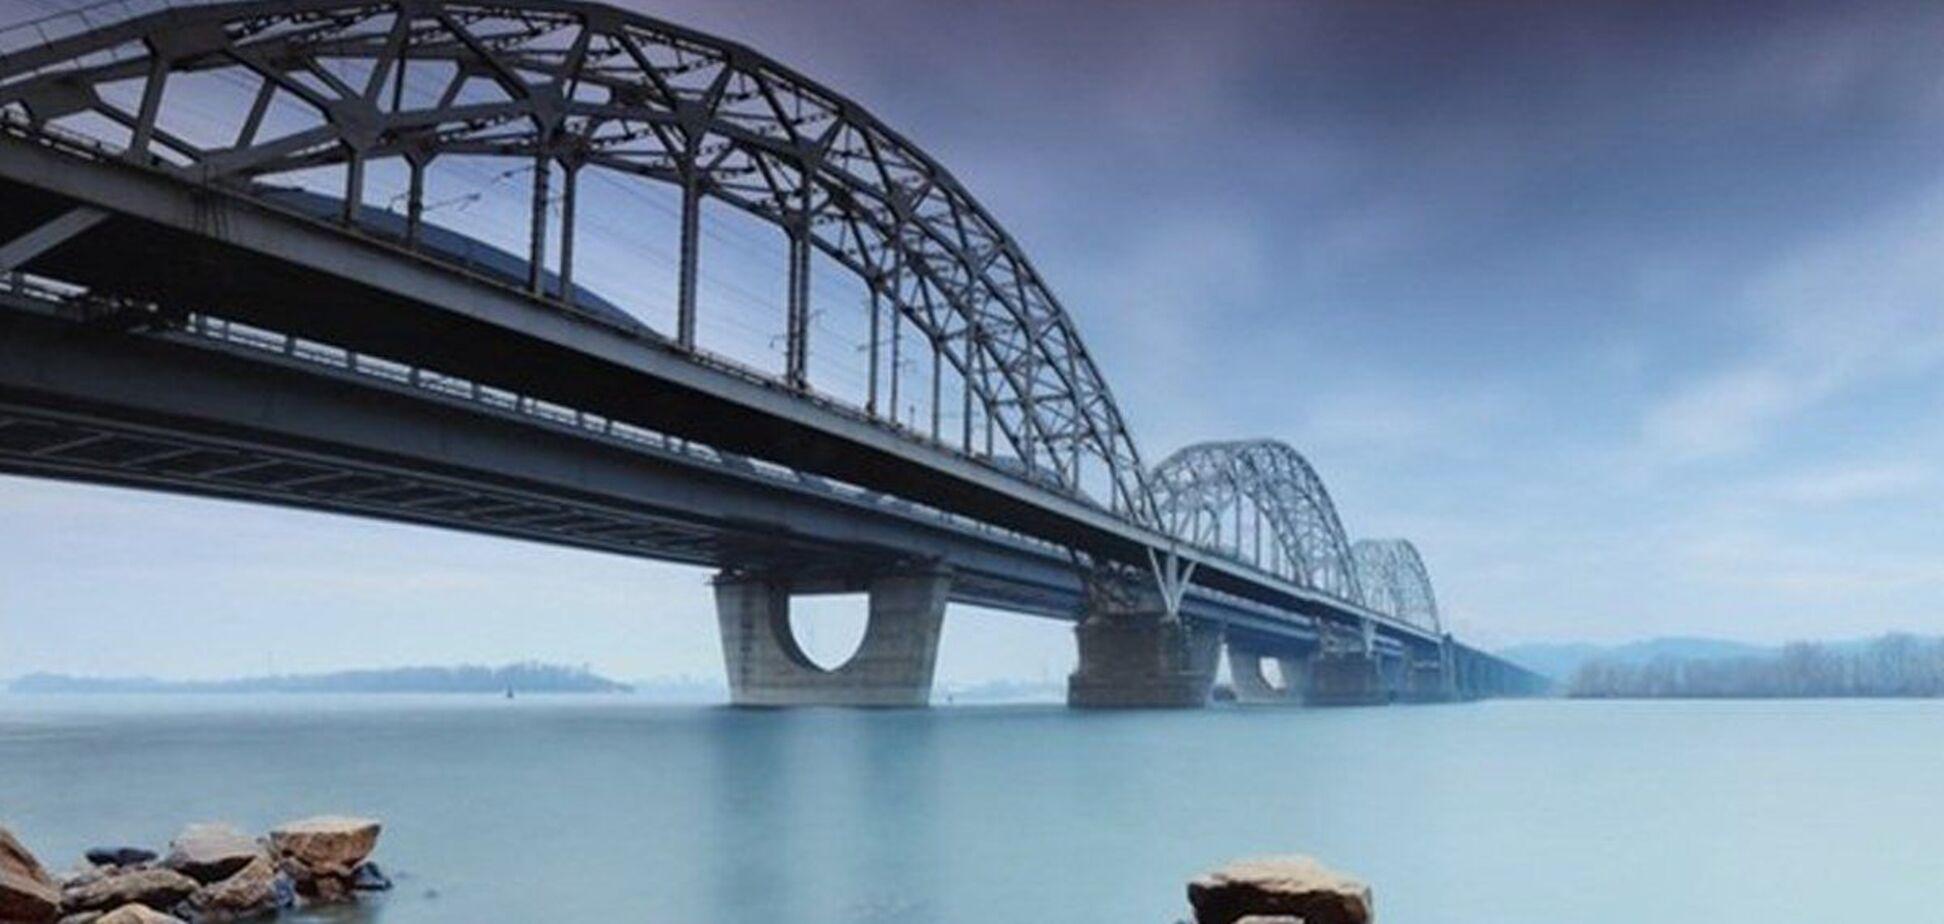 Наконец-то государство решило достроить Дарницкий мост